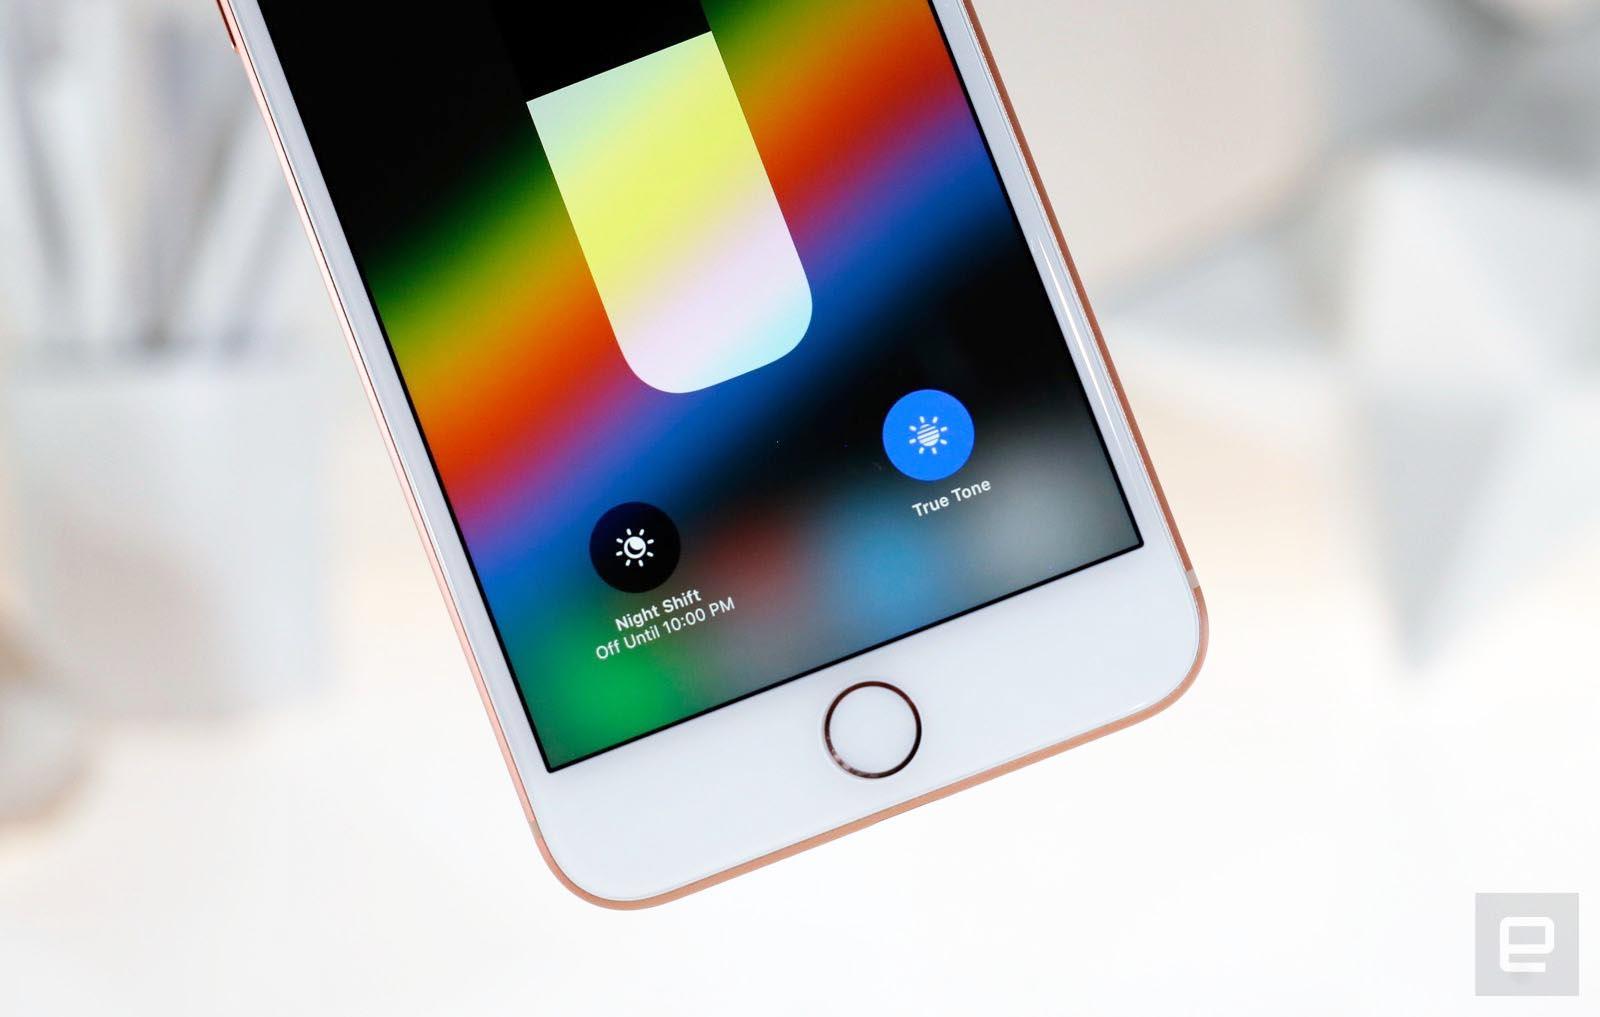 iPhone 8 True Tone